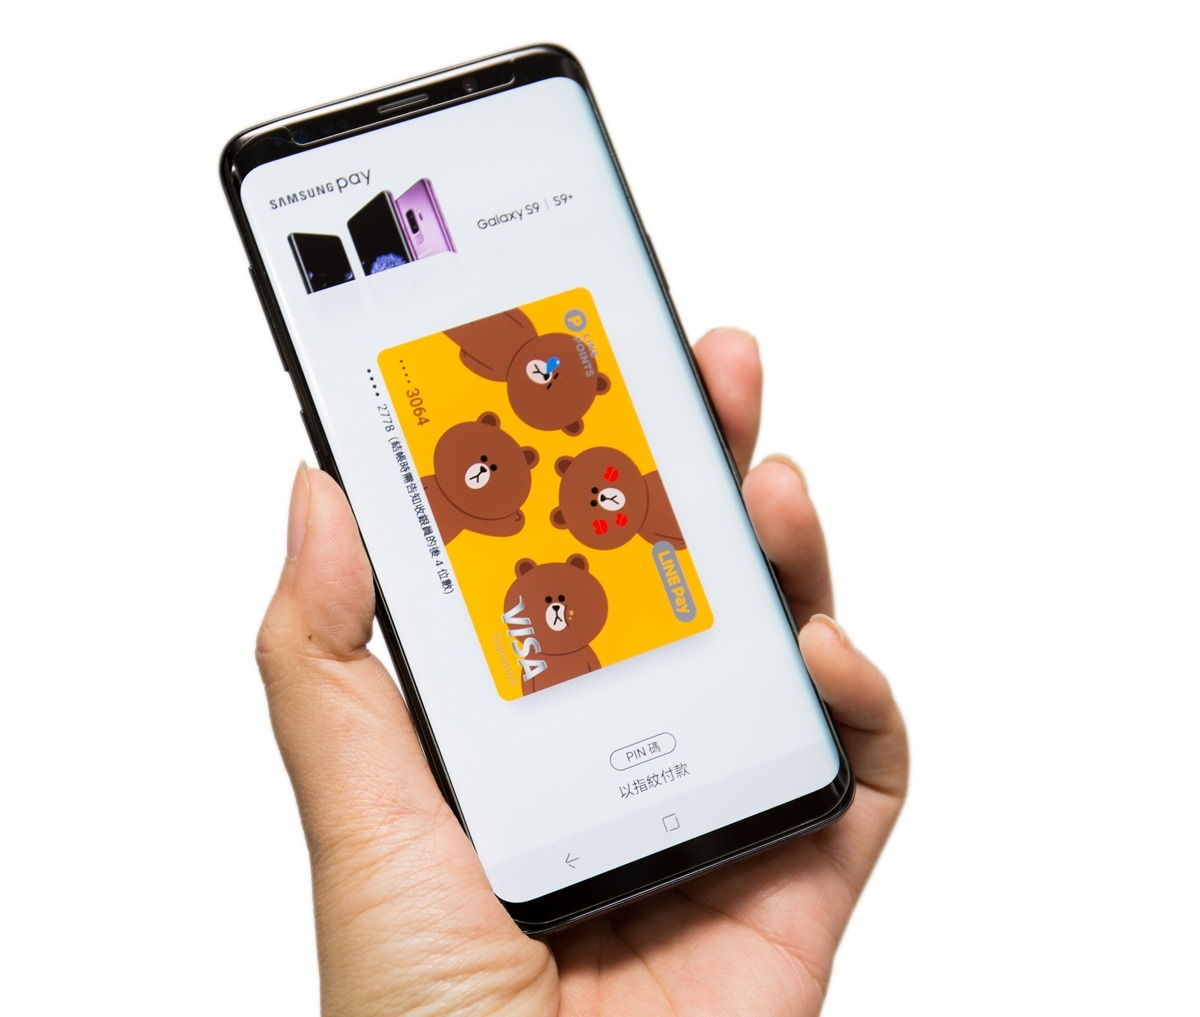 S845 港版 Galaxy S9+開箱 + 性能實測 + 常見問題(台灣可以用嗎?電信支援?行動支付?雙 4G?)@3C 達人廖阿輝